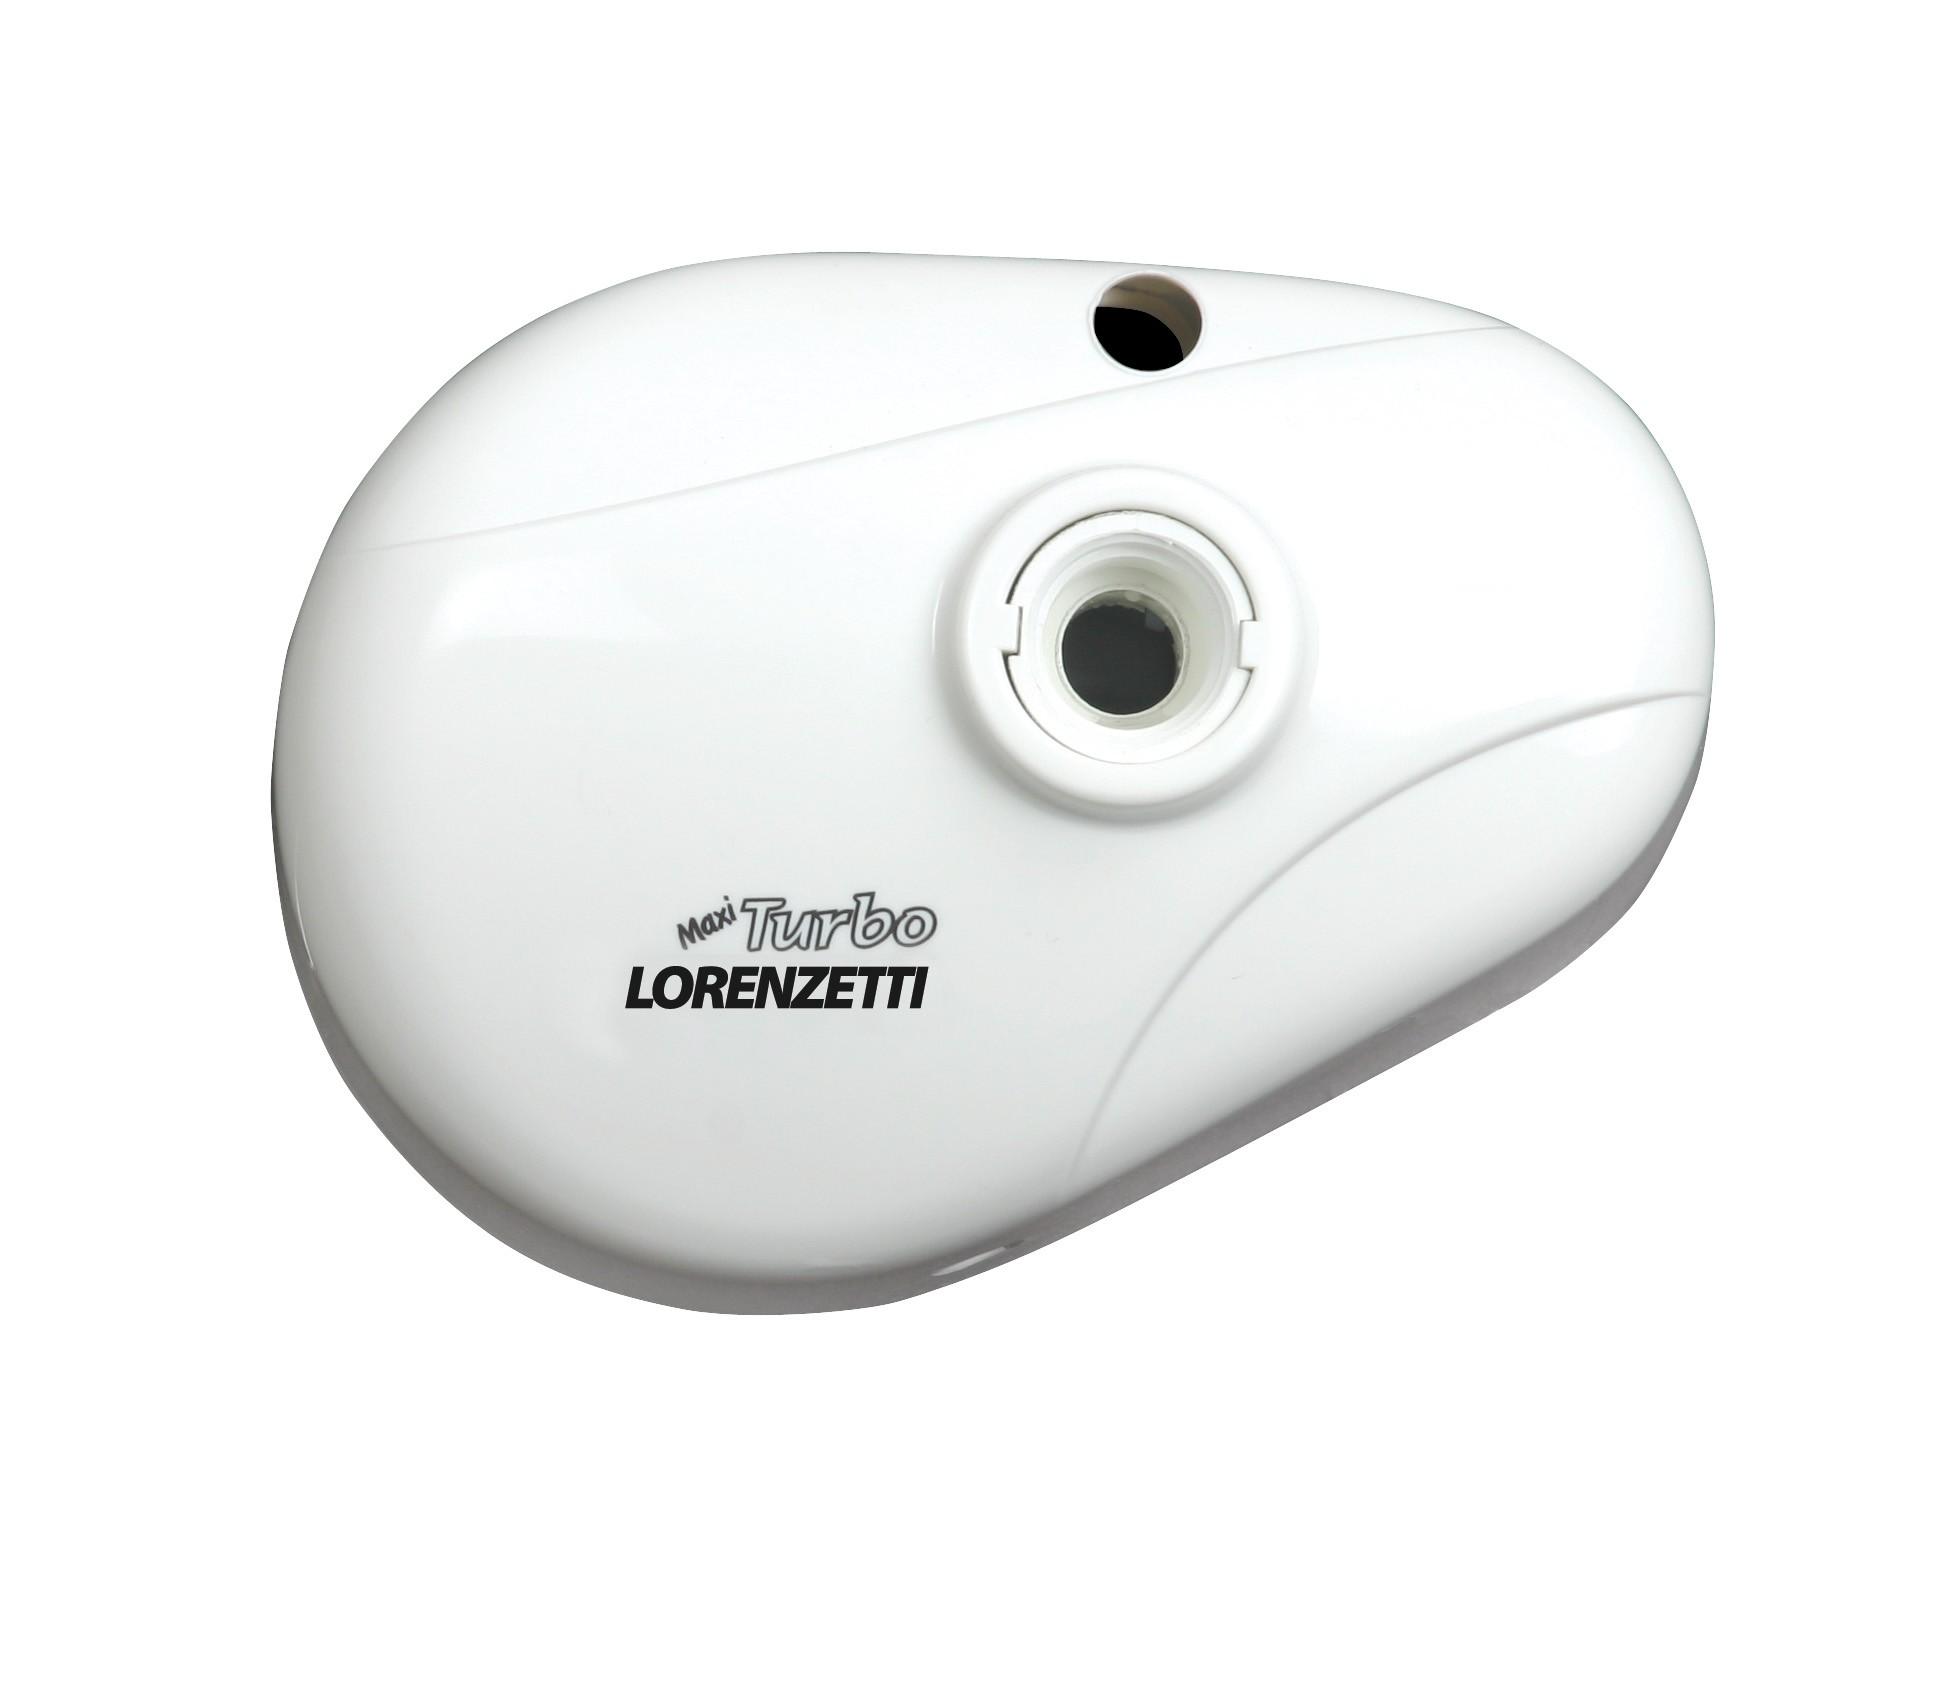 Pressurizador Para Chuveiros e Duchas - Maxi Turbo Lorenzetti